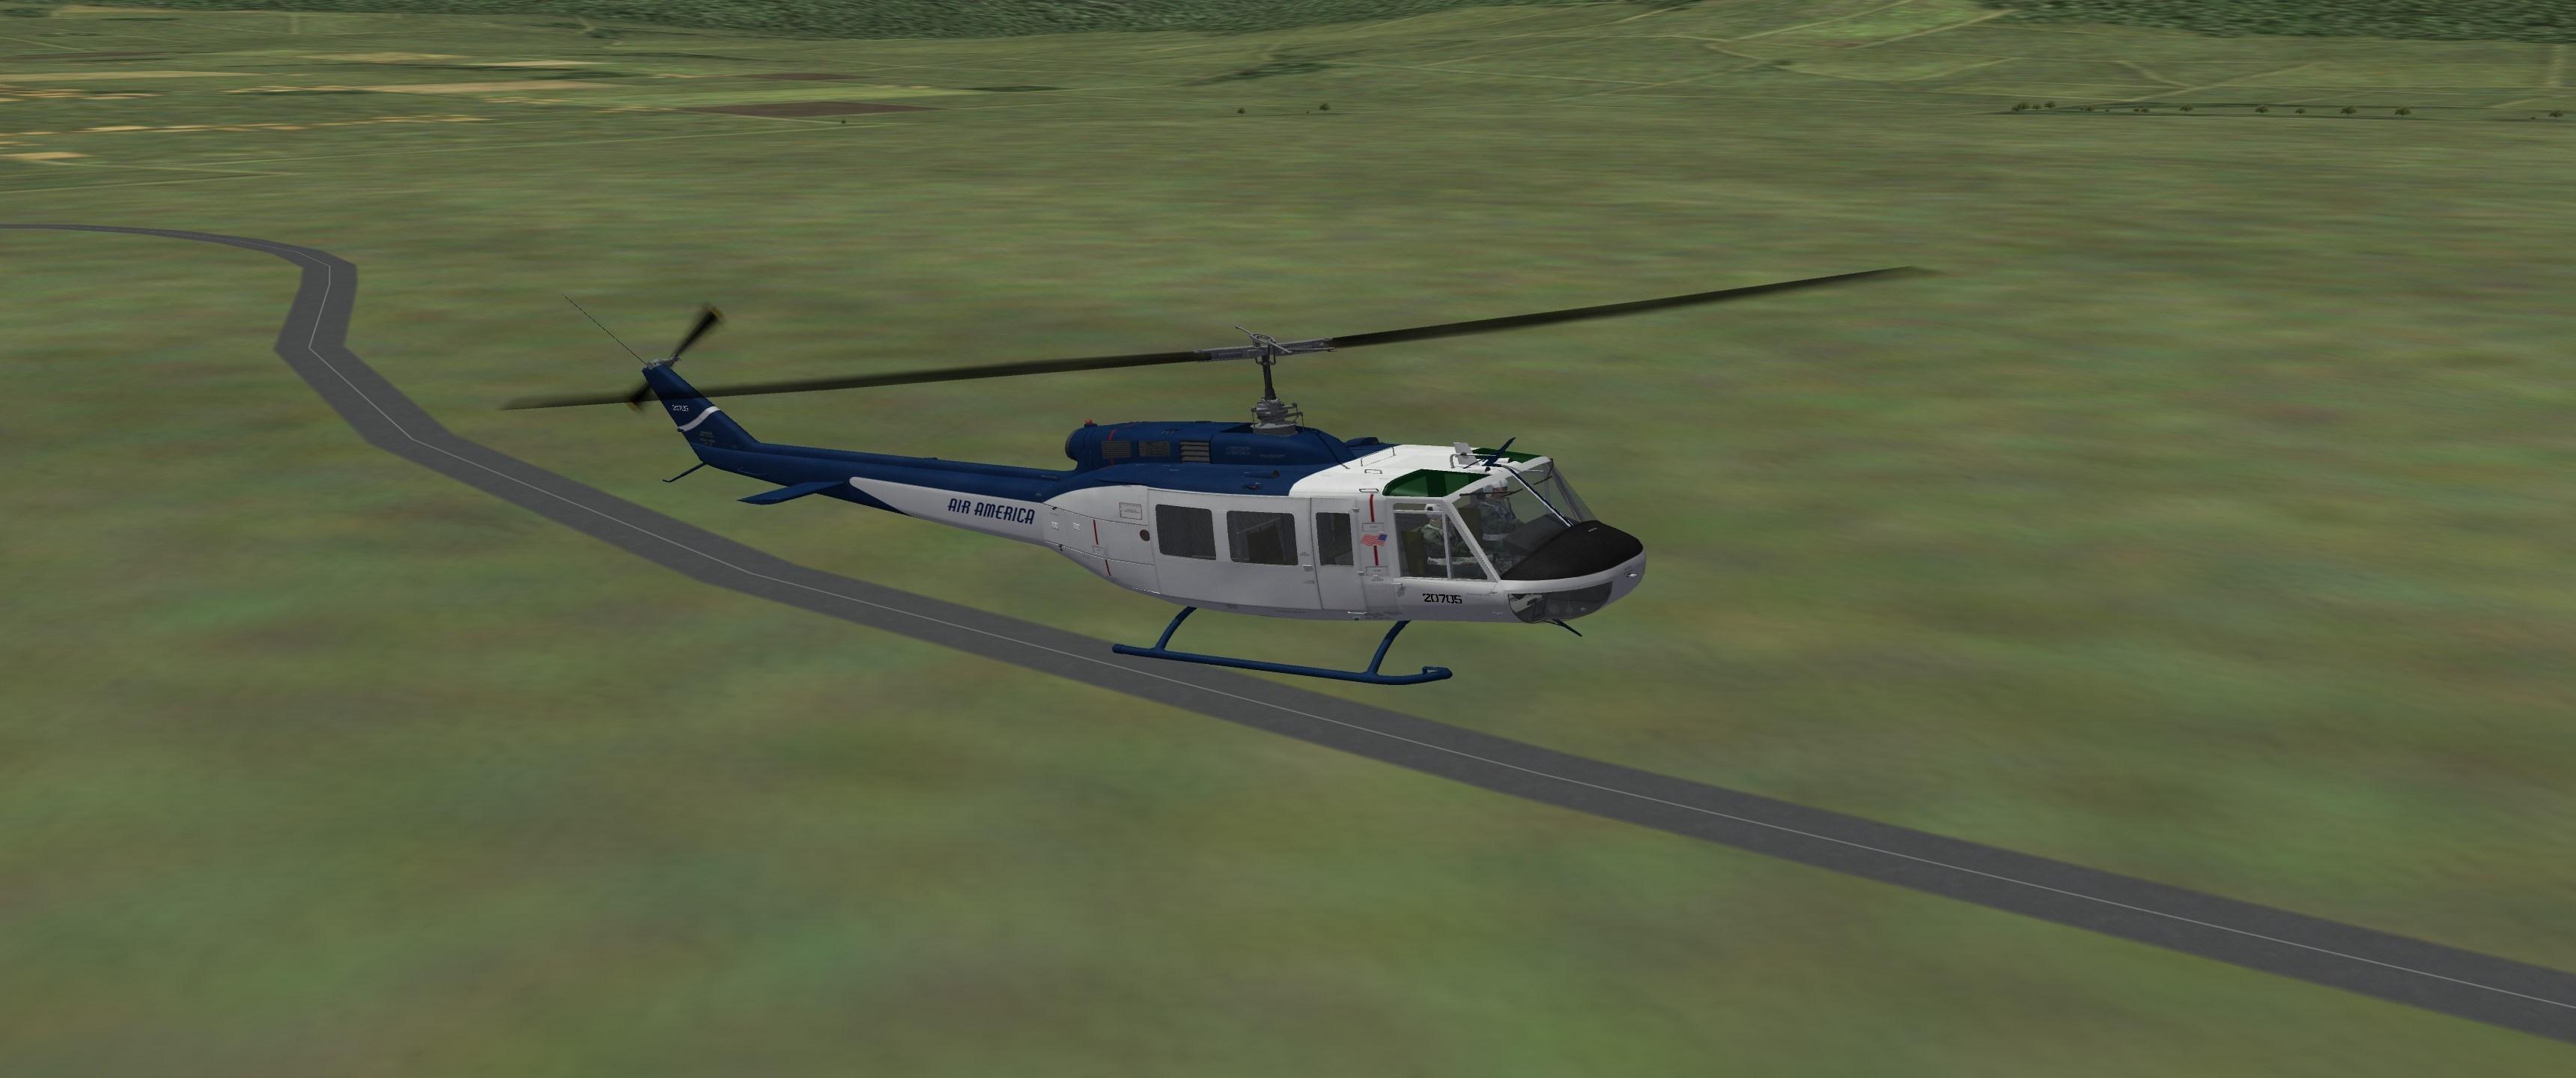 UH-1H HUEY (VIETNAM WAR)